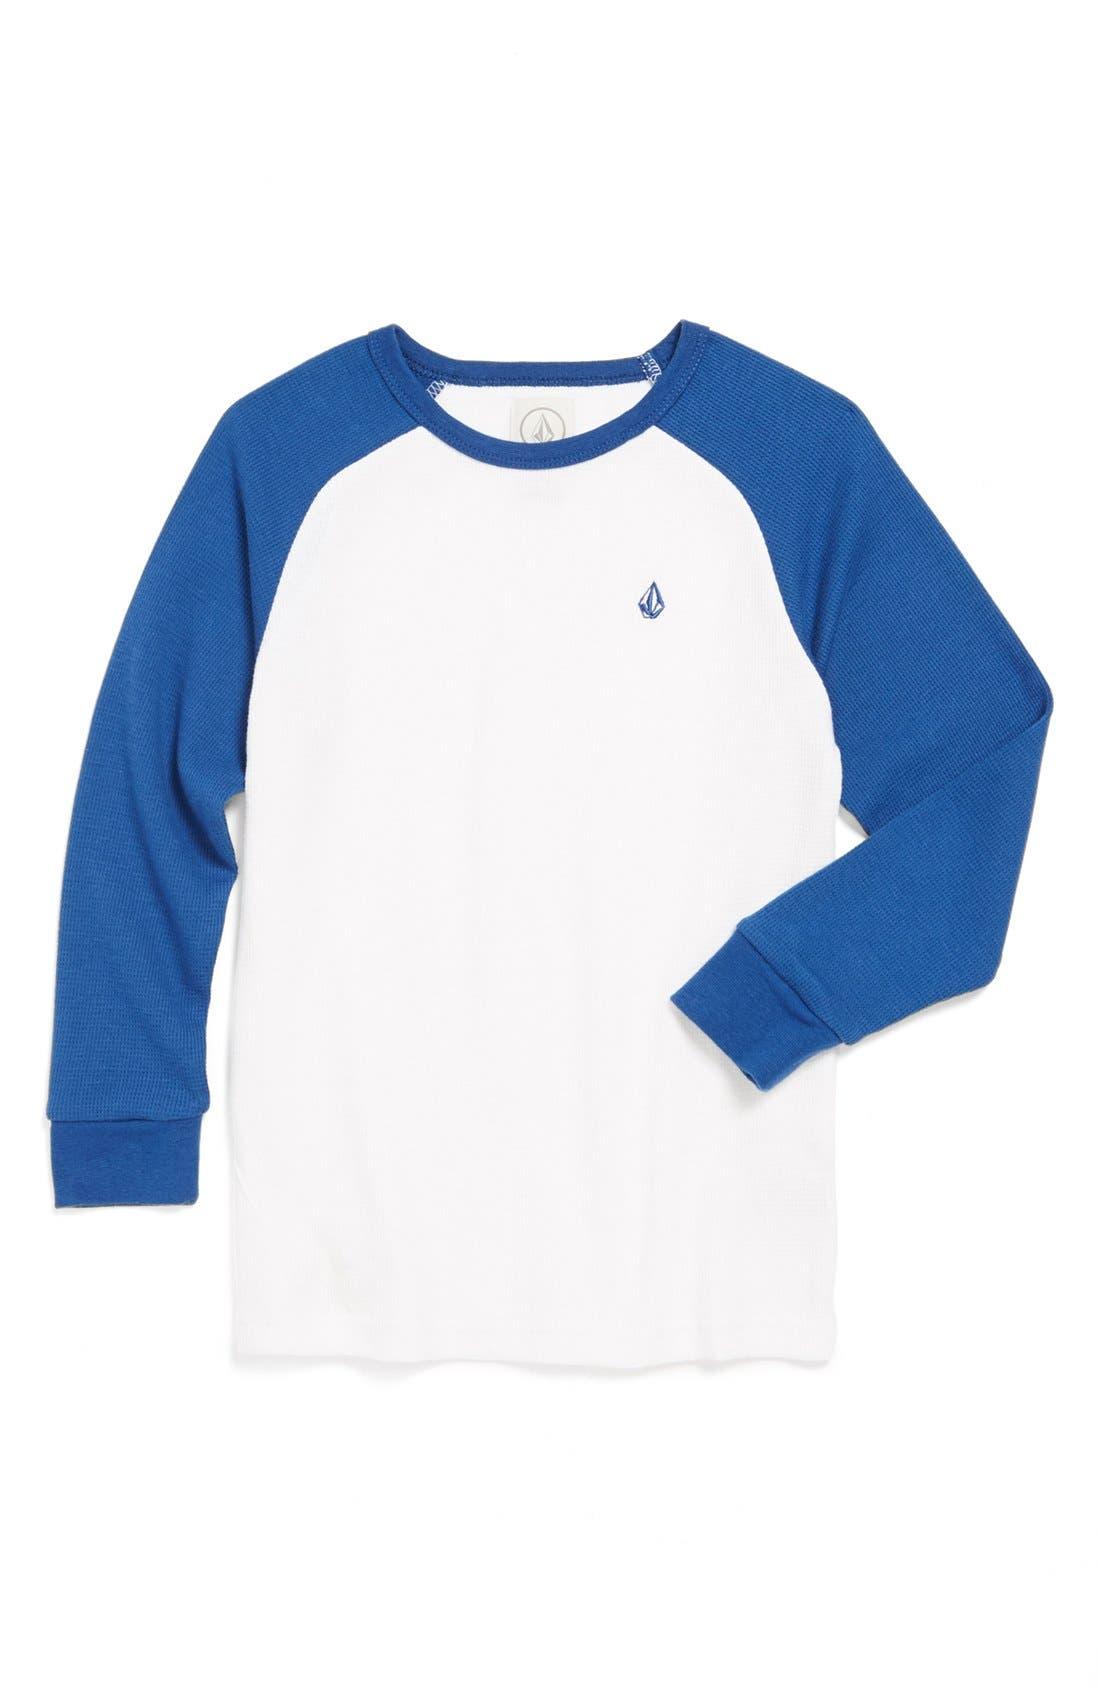 Alternate Image 1 Selected - Volcom 'Fabuloso' Raglan Long Sleeve Raglan Thermal T-Shirt (Little Boys)